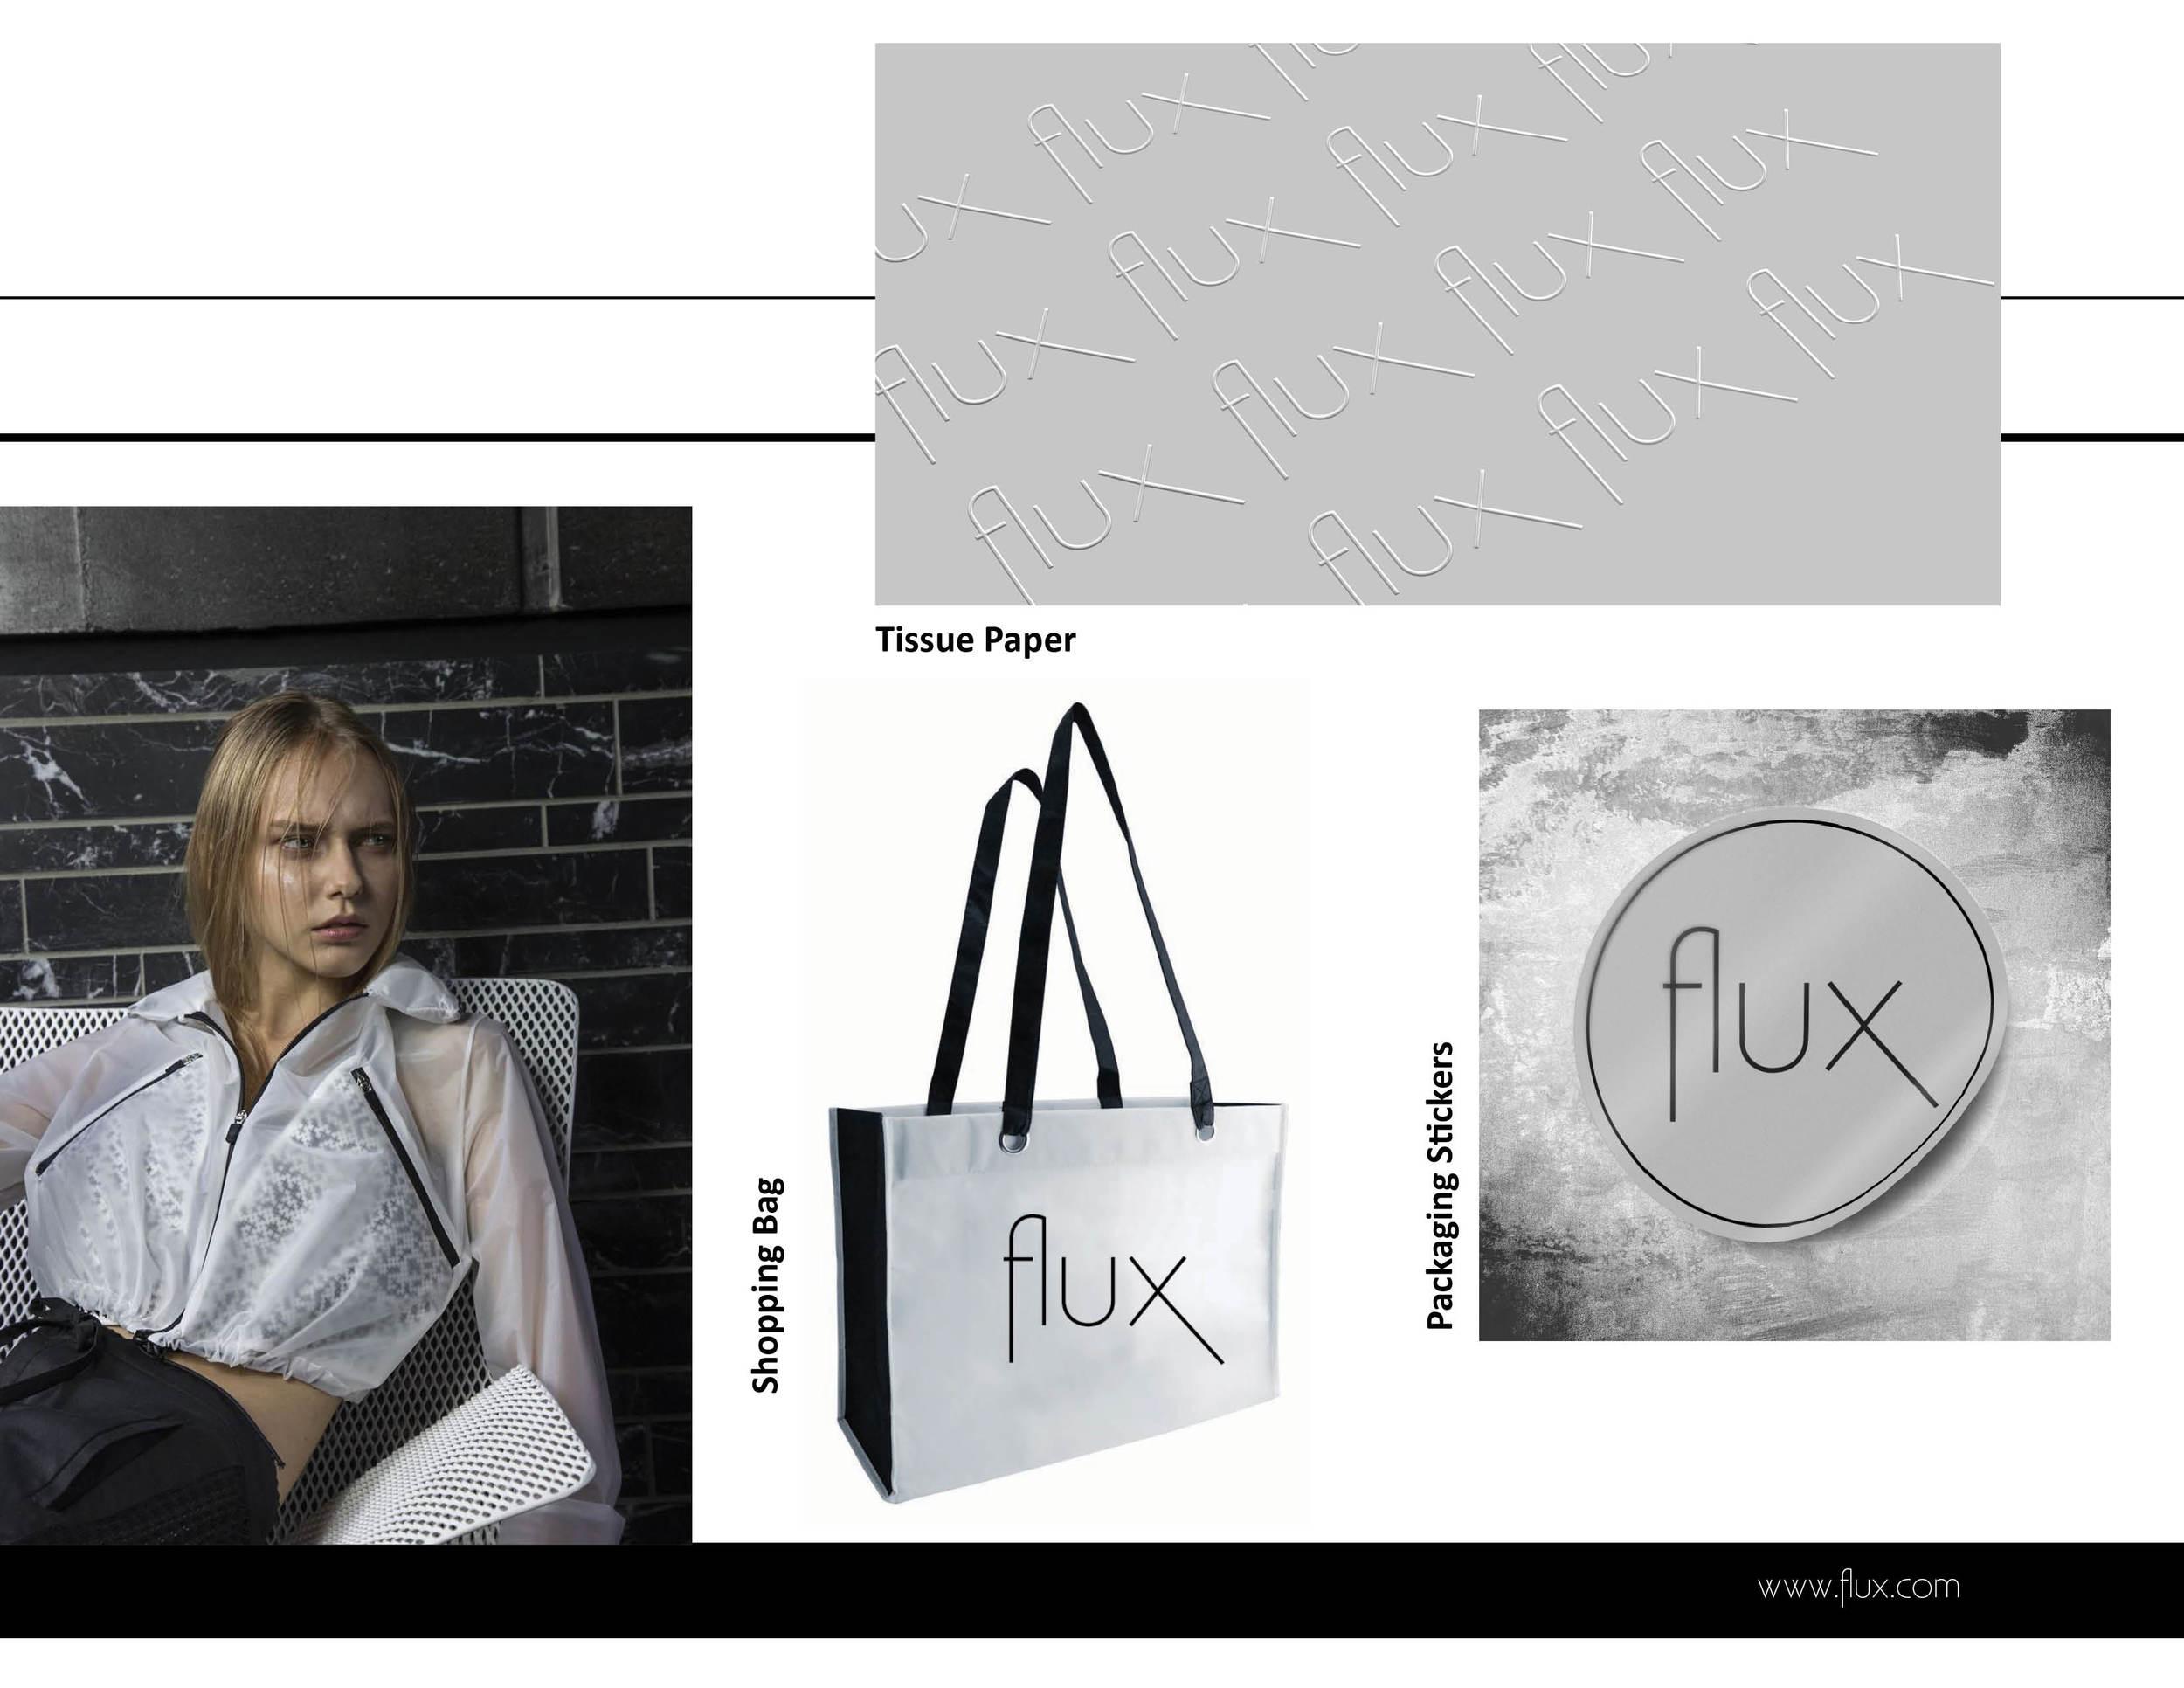 Flux_ReportPAGES92.jpg